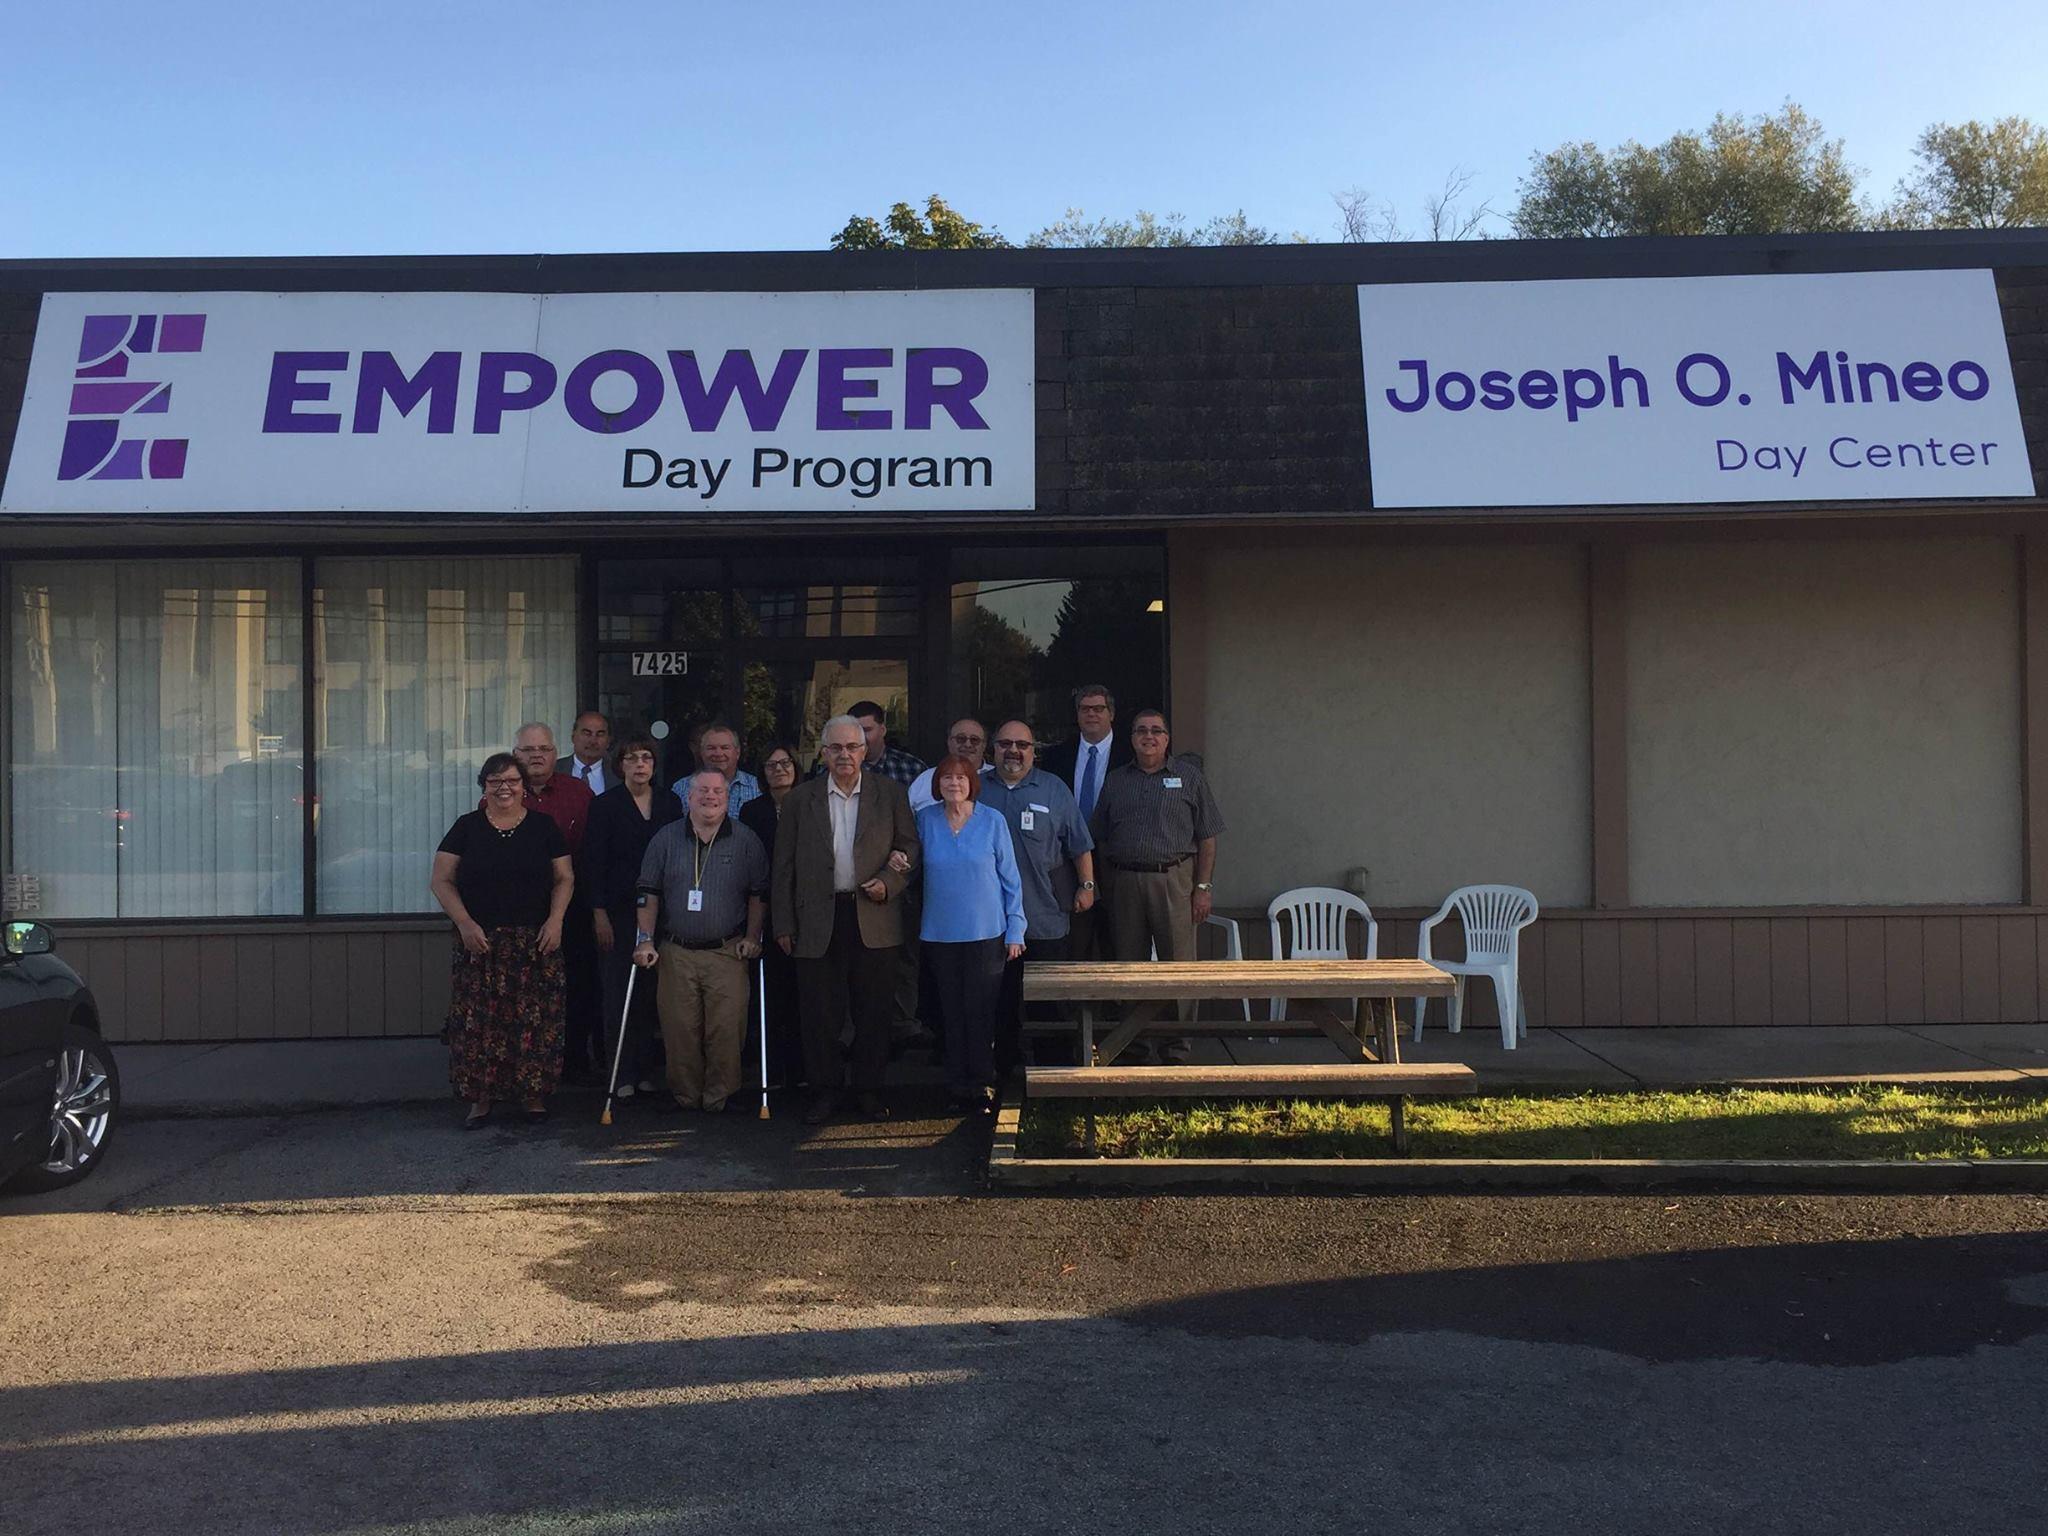 Joseph O. Mineo Day Center